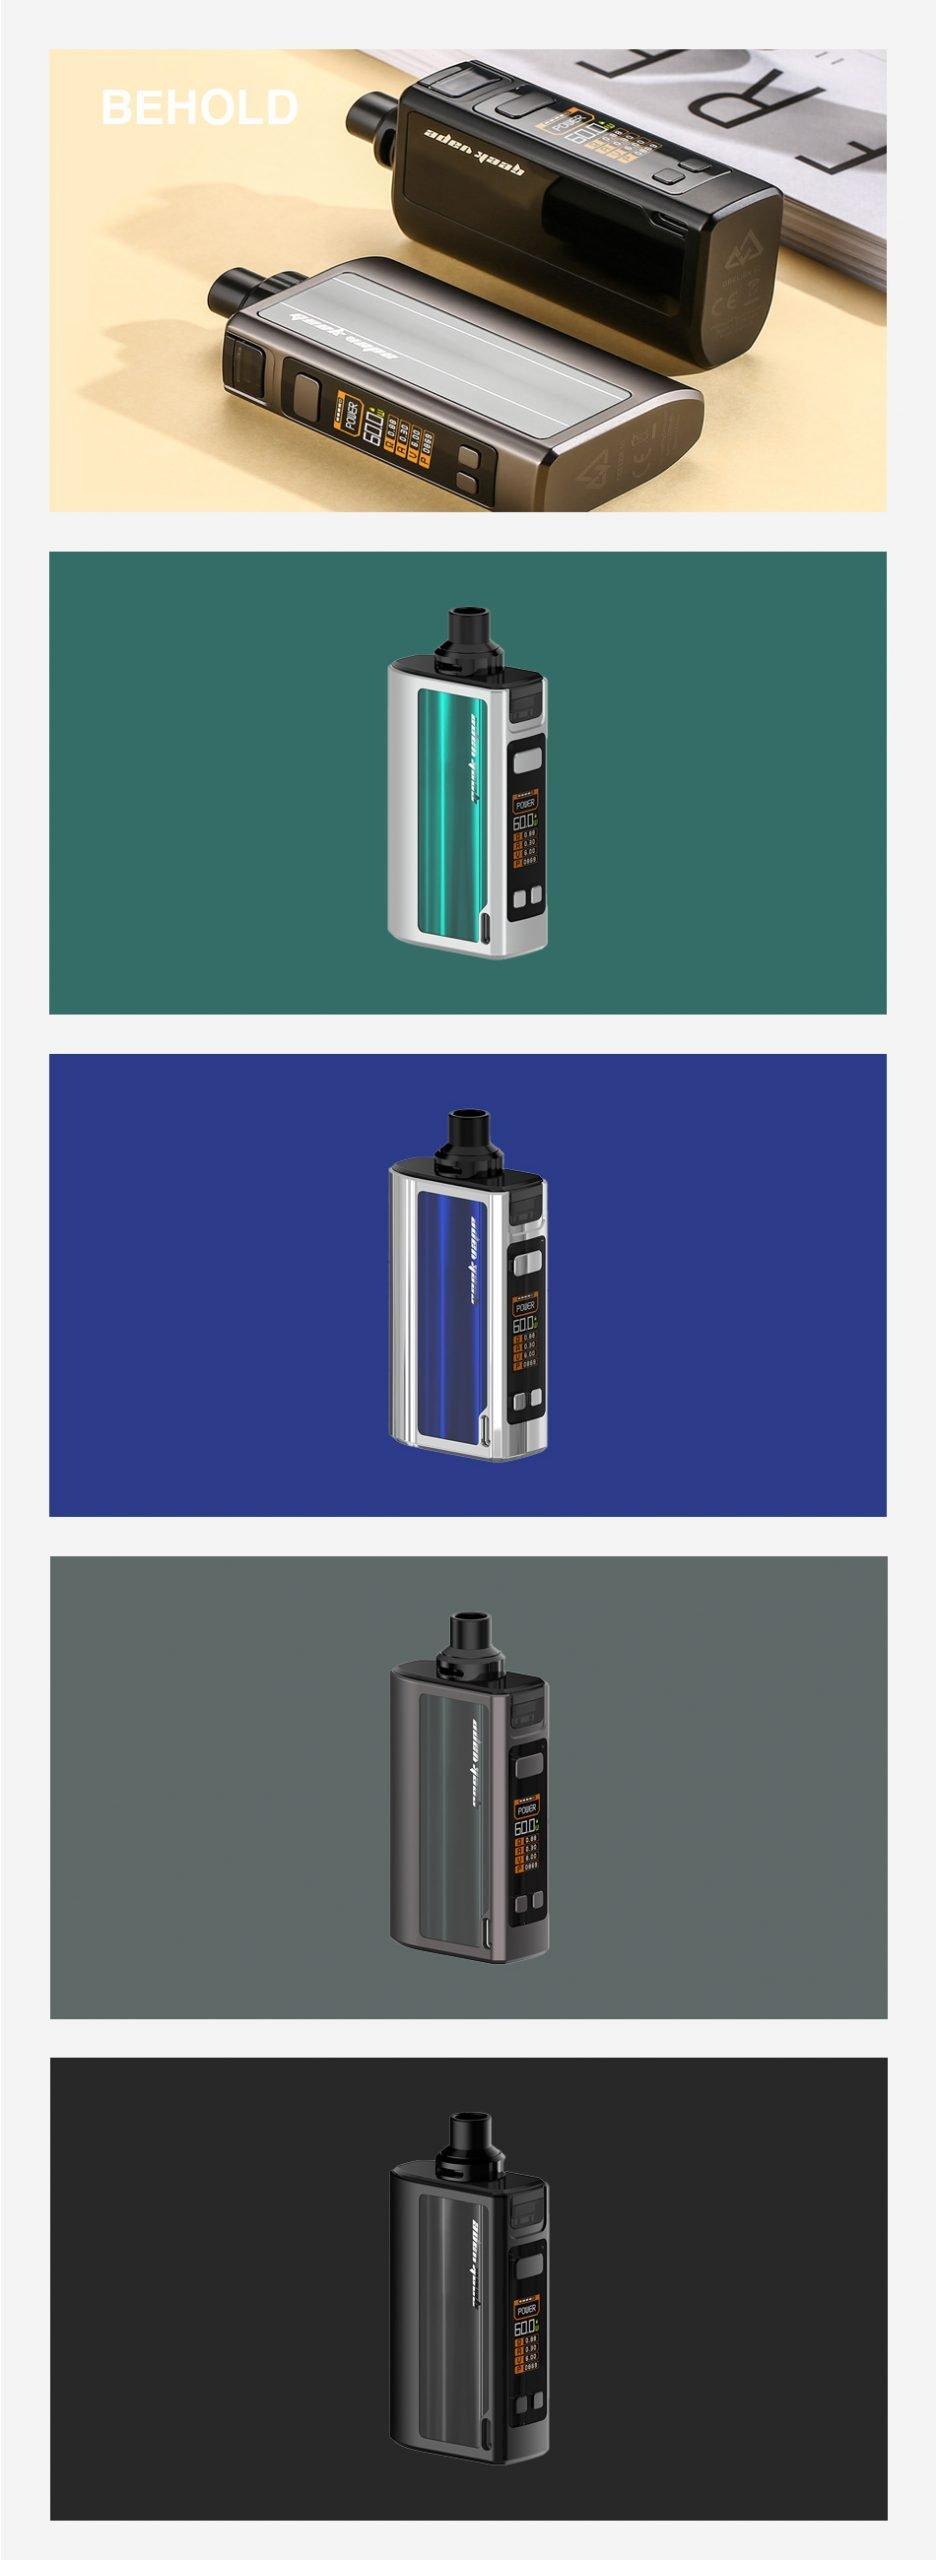 GeekVape-Obelisk-60-Pod-Kit-UK-Features